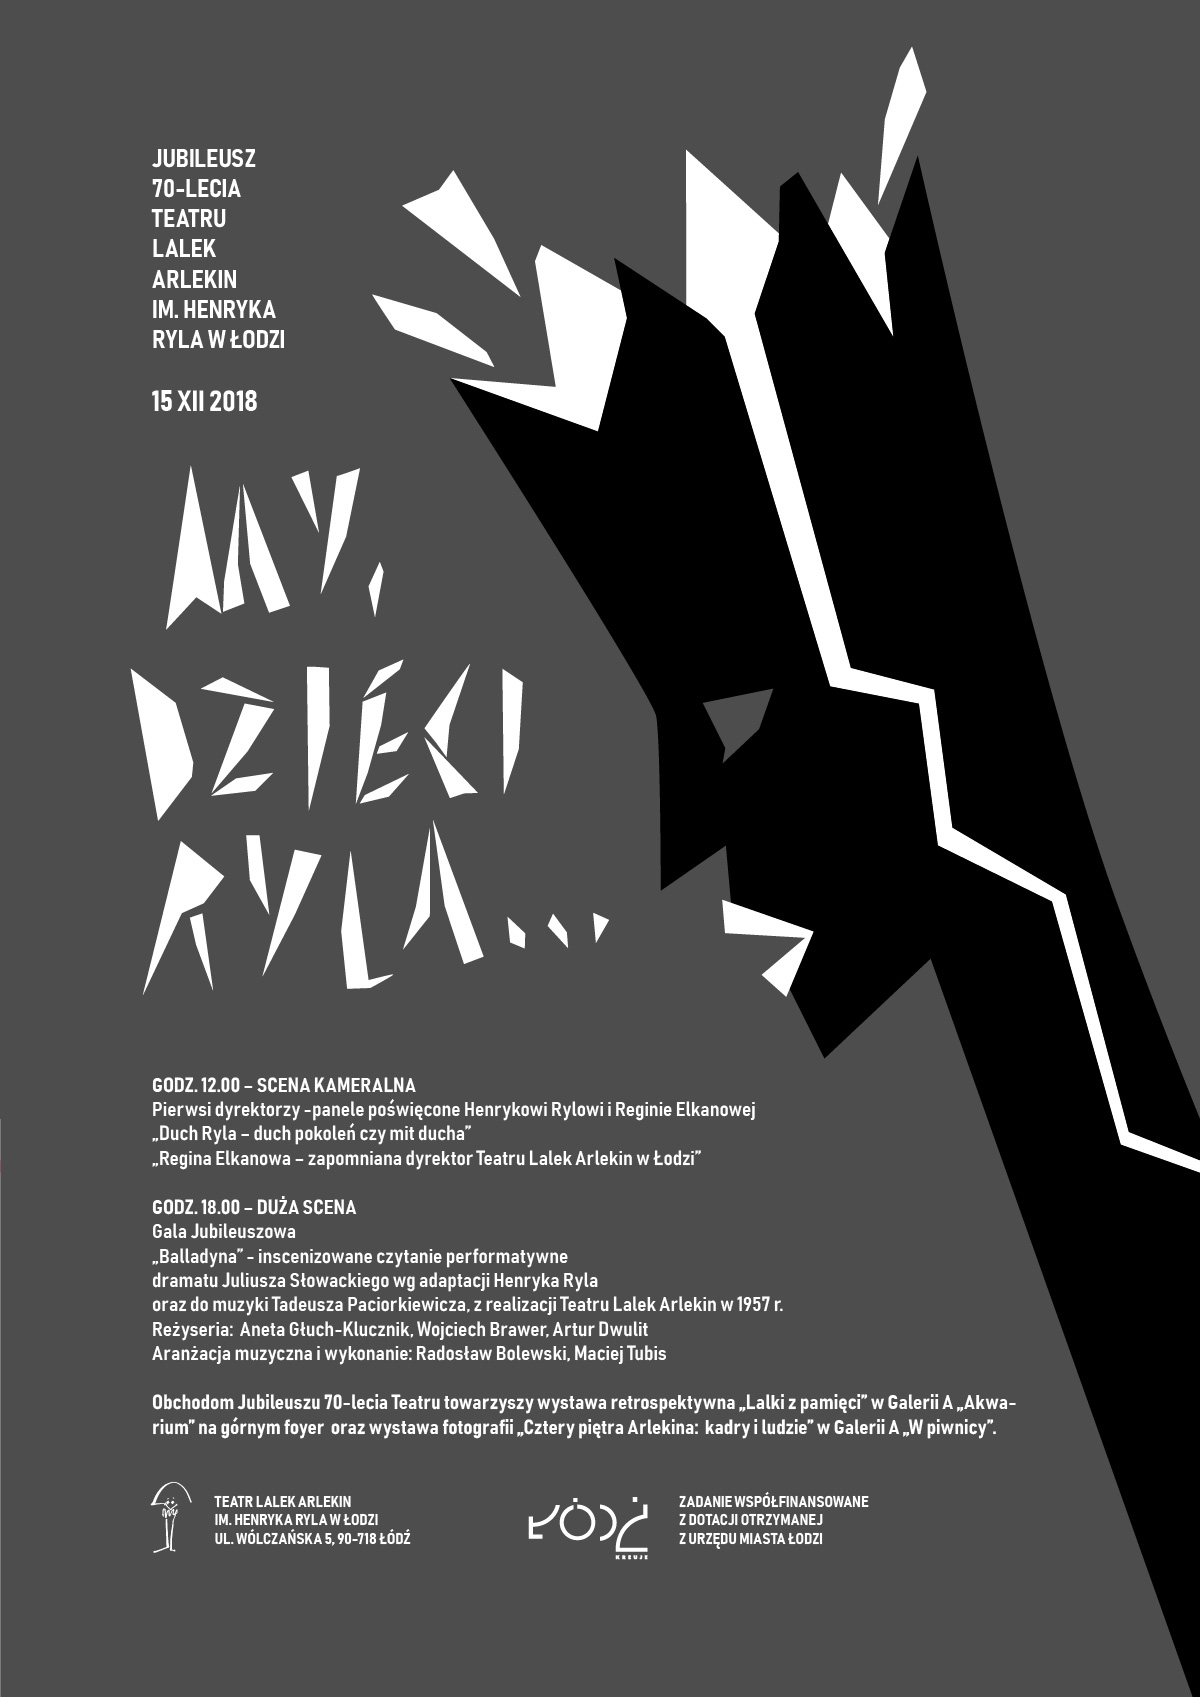 titleStart - Teatr Lalek Arlekin im  Henryka Ryla w Łodzi